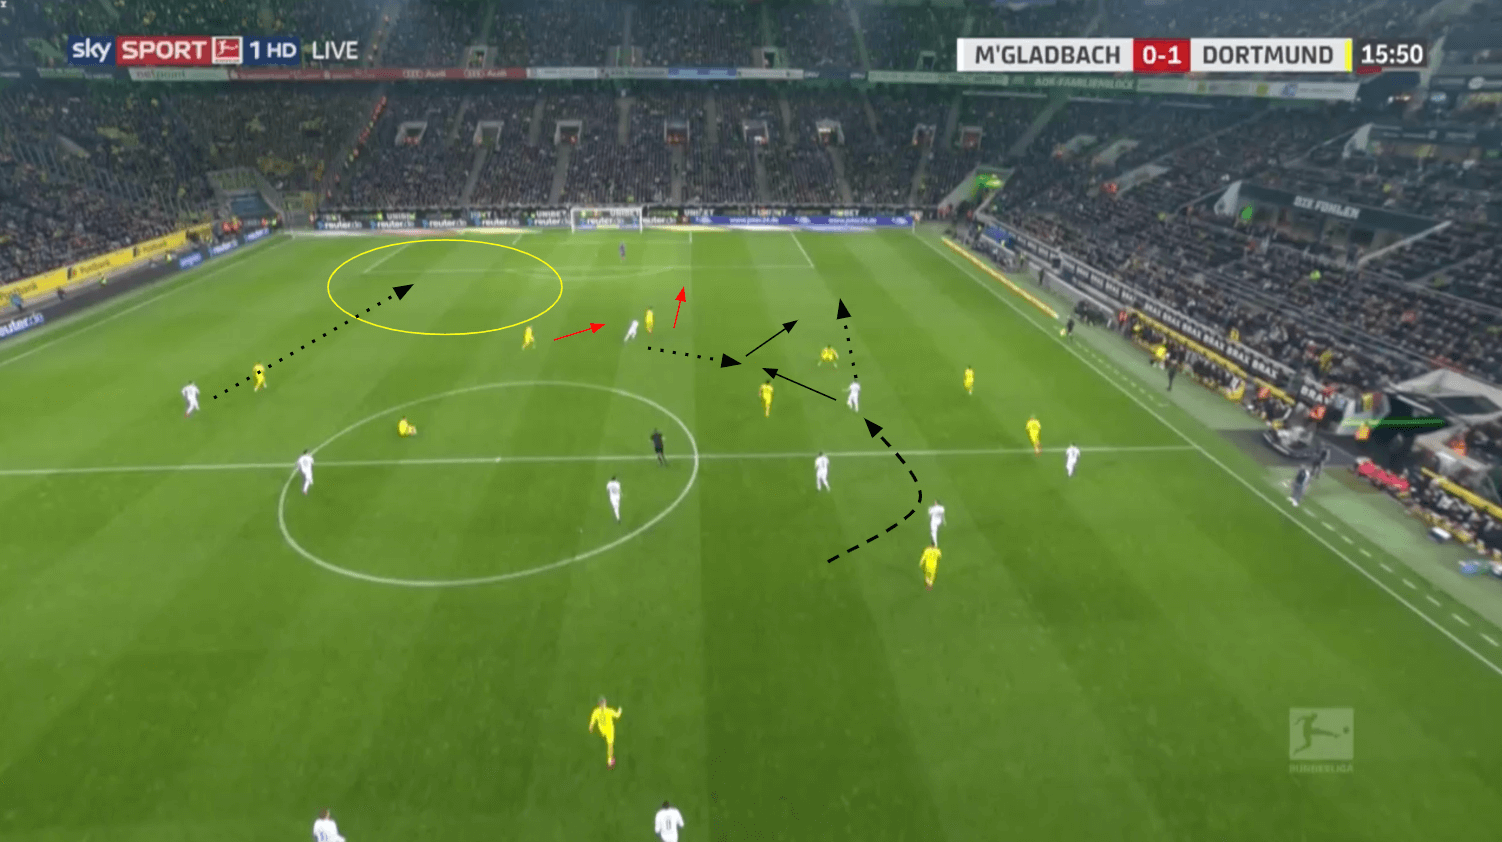 Bundesliga 2019/20: Borussia Mönchengladbach vs Borussia Dortmund - tactical analysis tactics